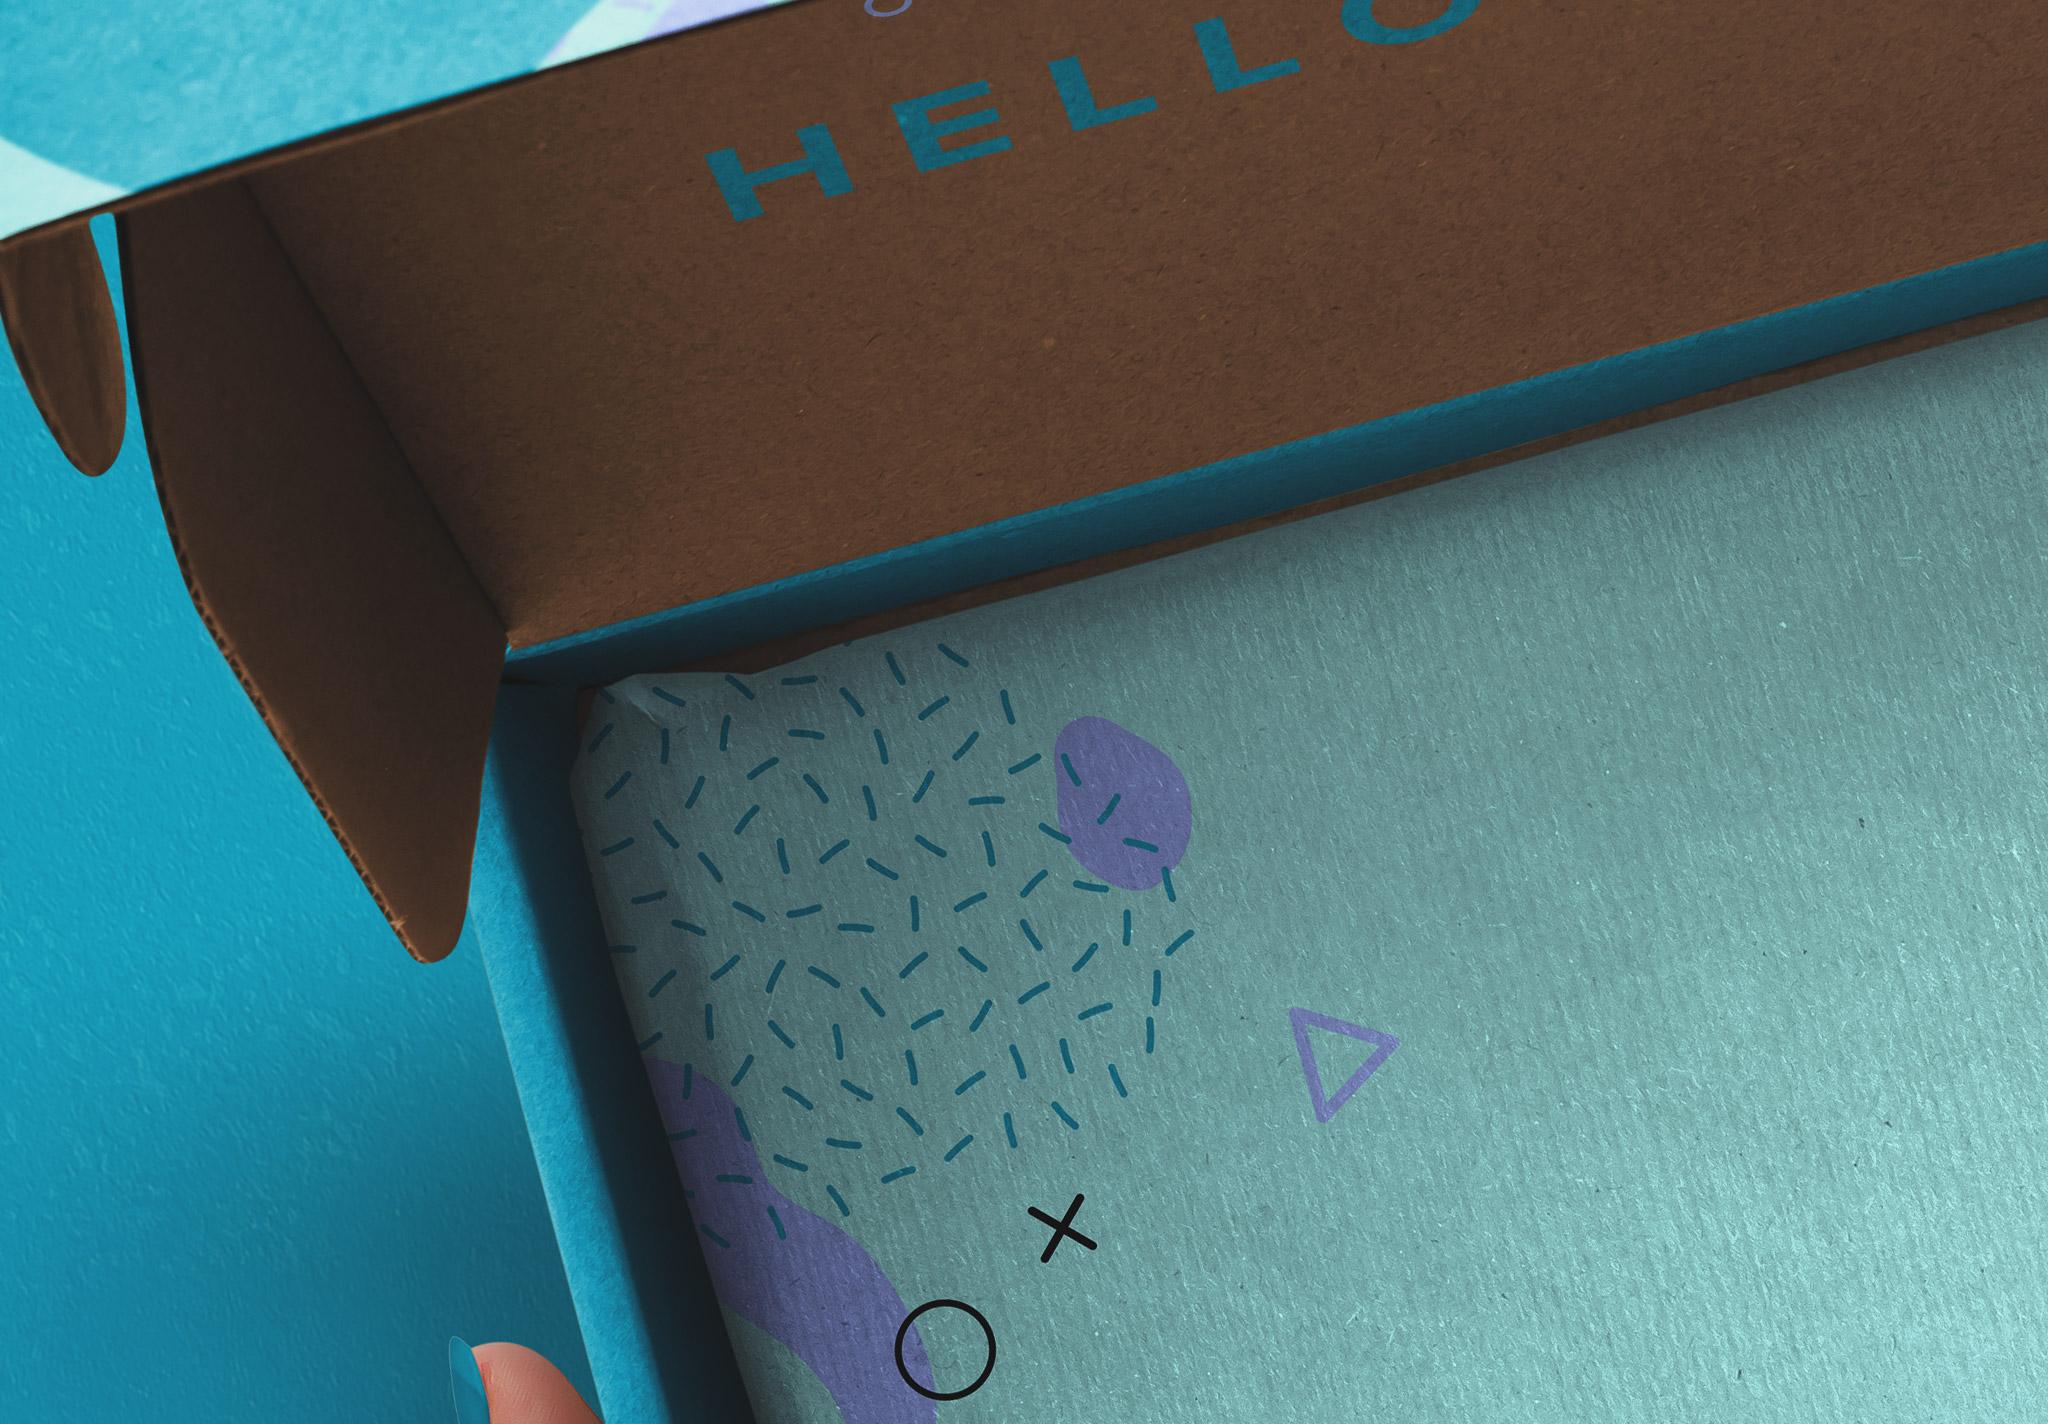 Hands Holding Opened Postal Box Mockup image04